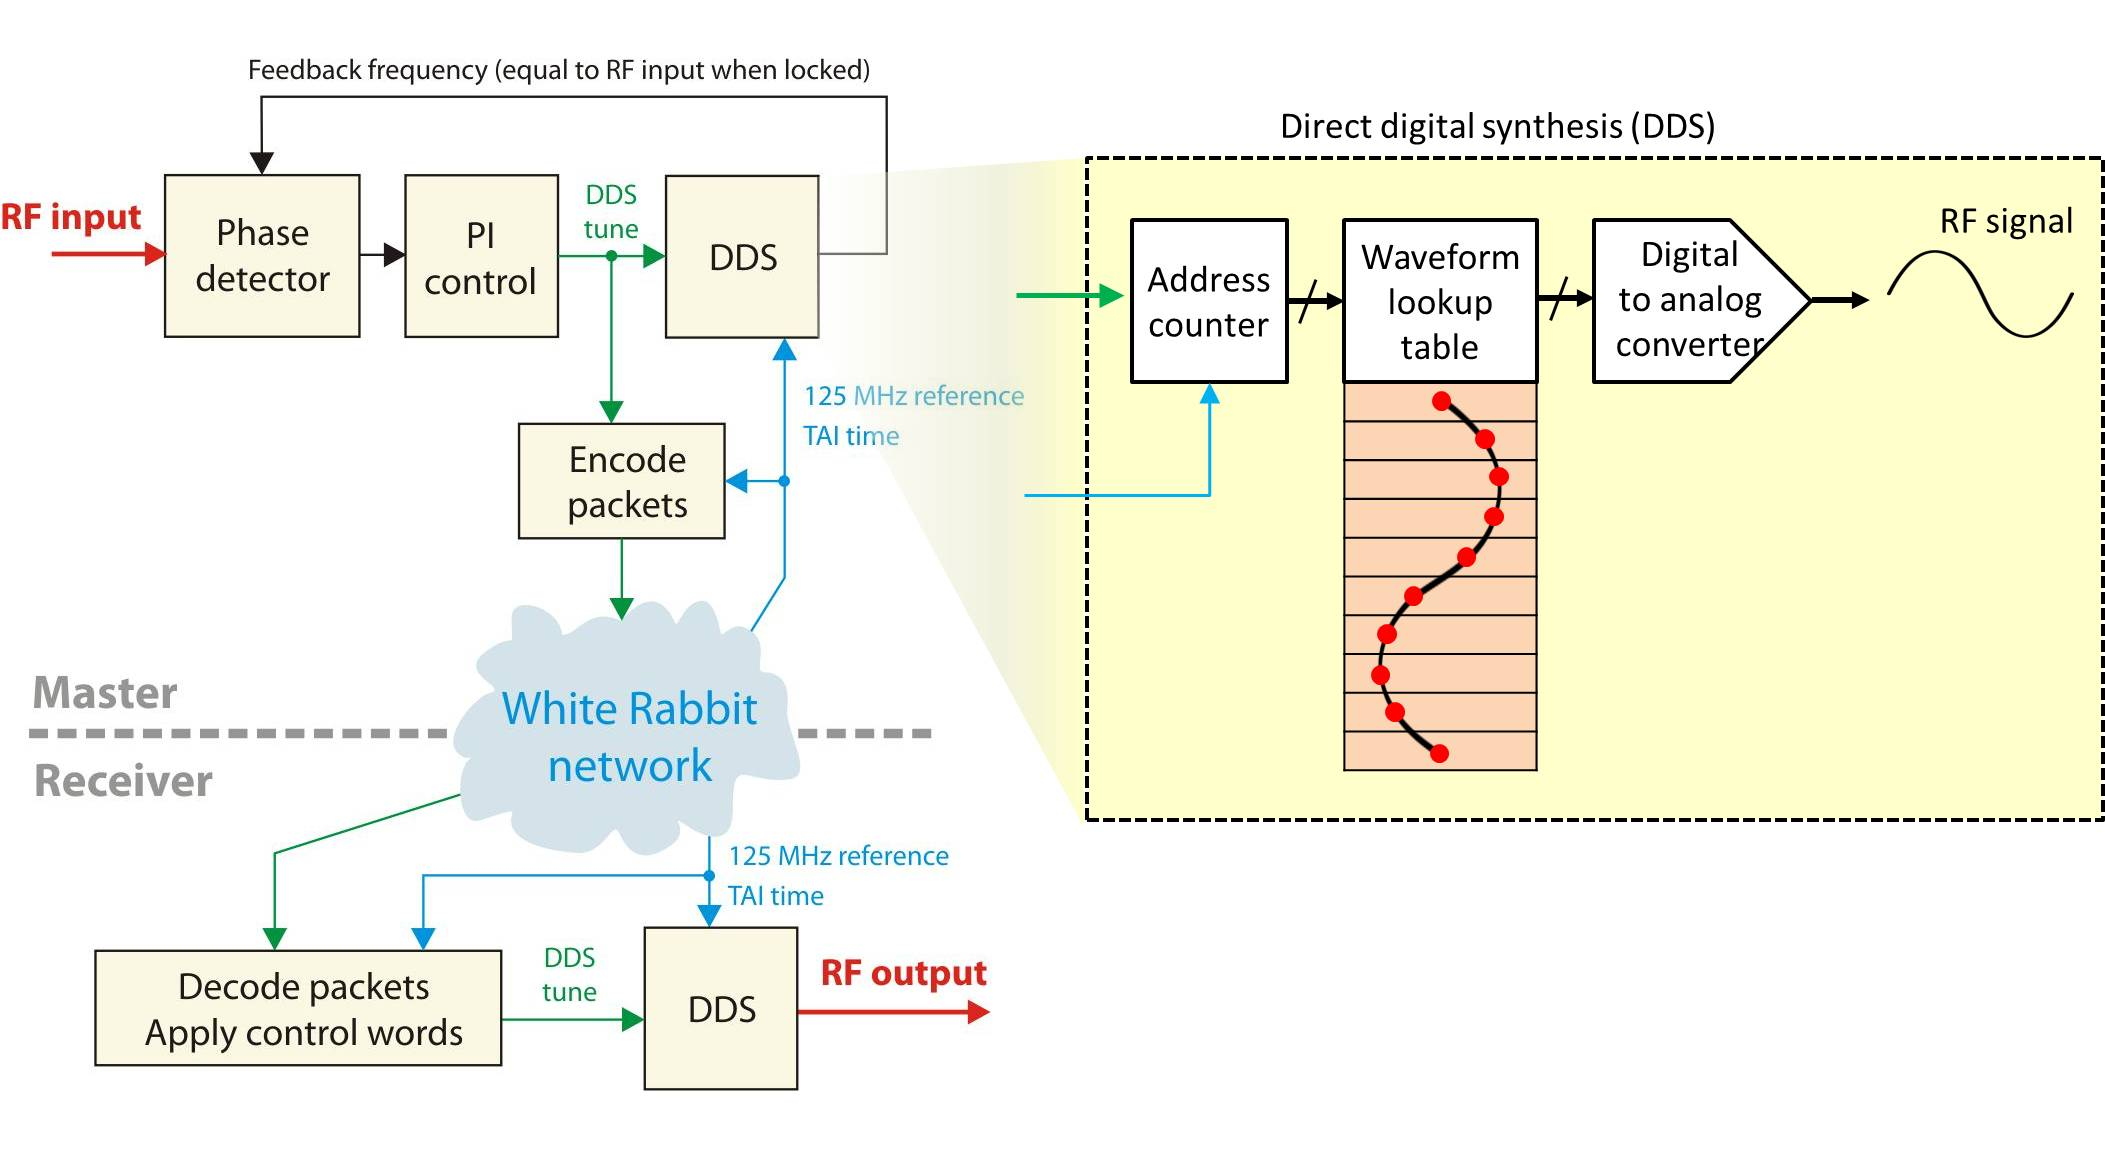 figures/applications/DDS-1.jpg